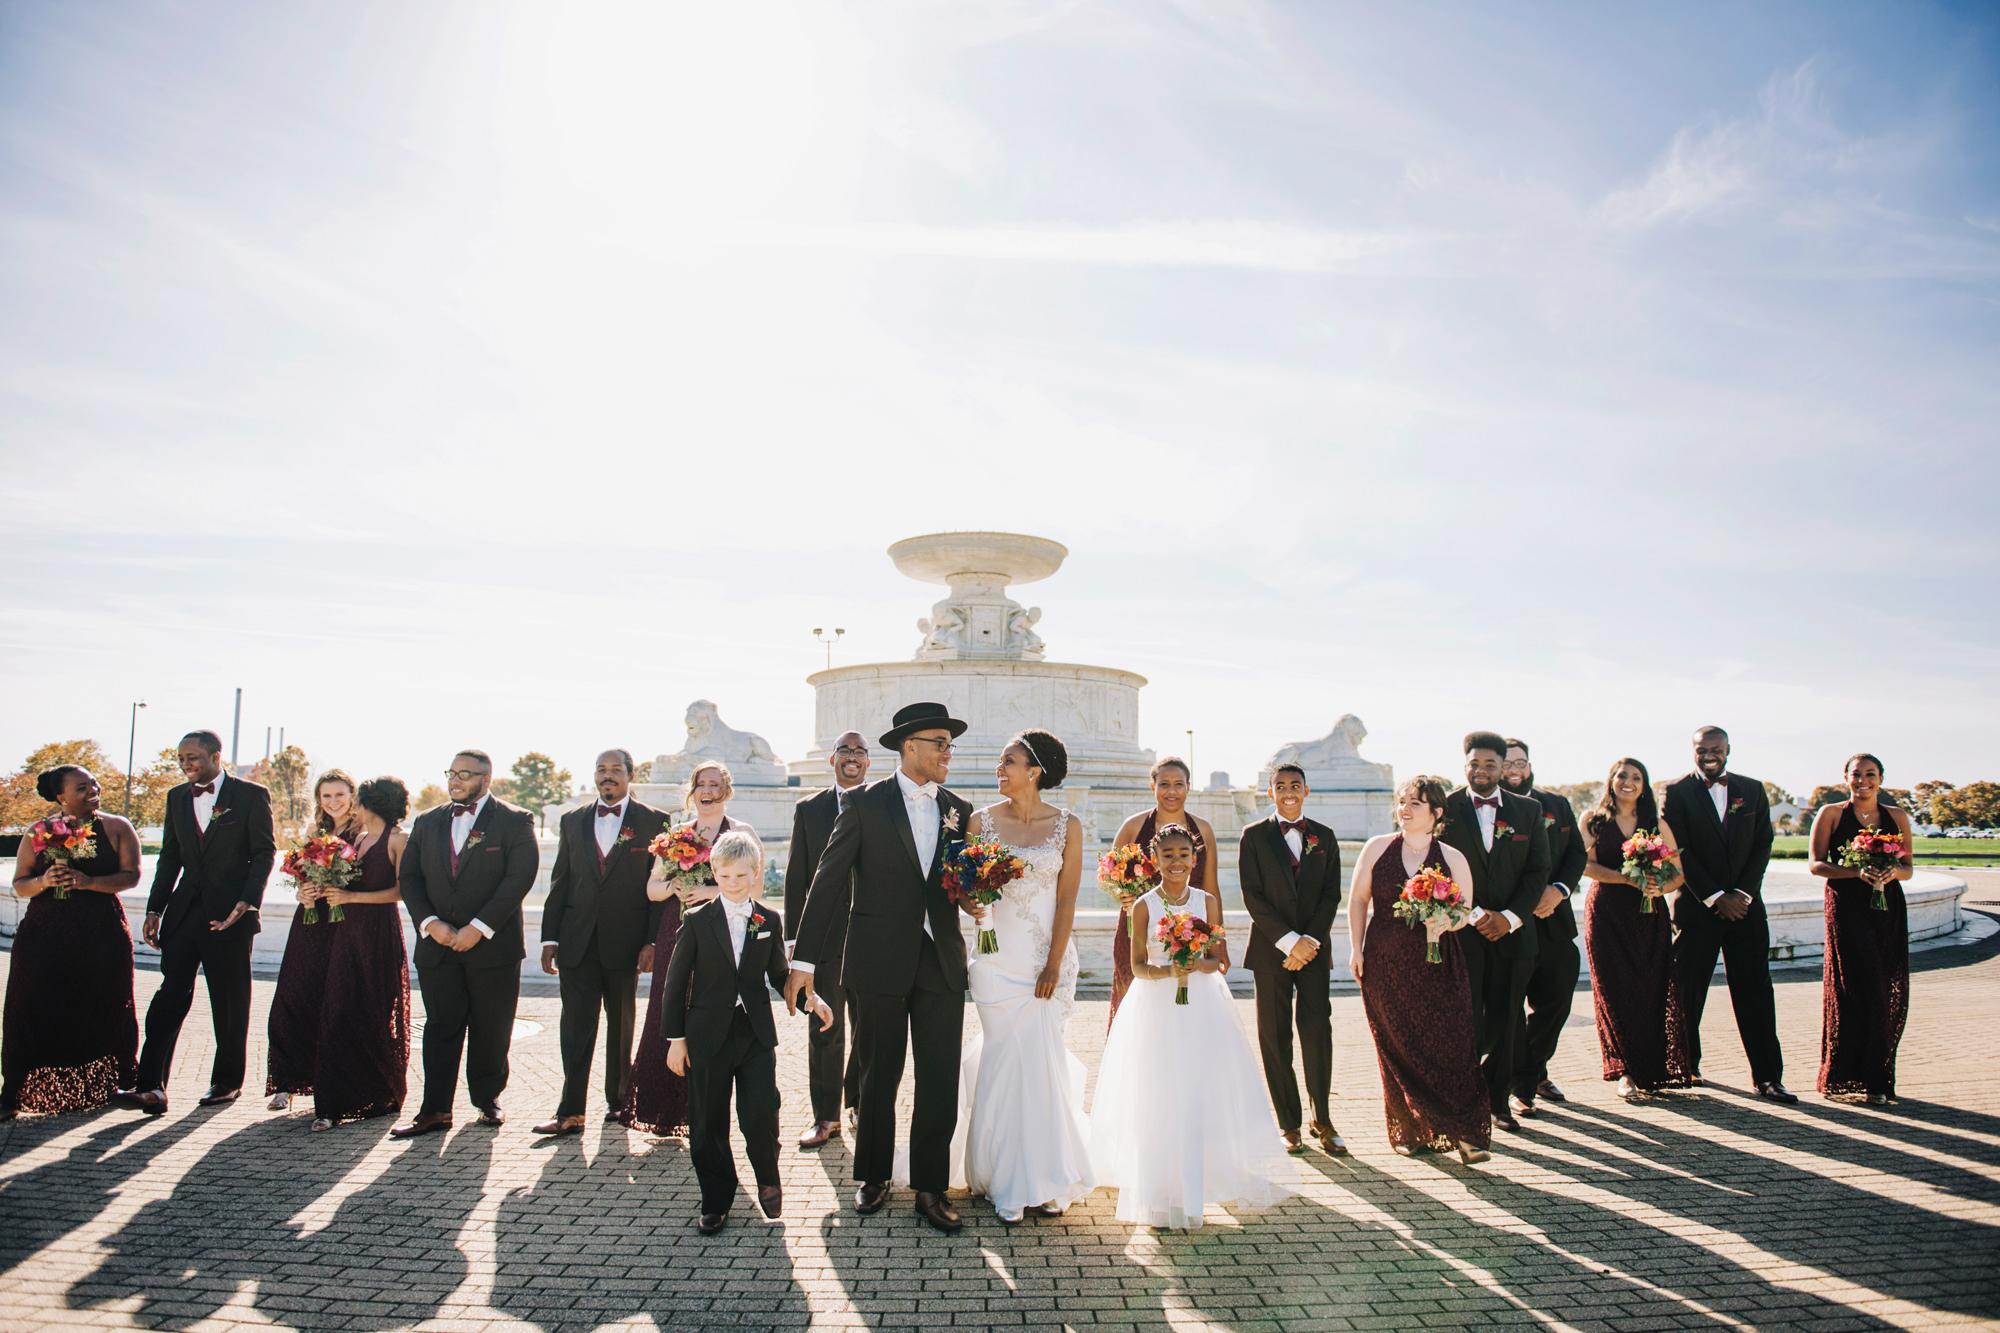 Faoro-2017-Weddings-075.jpg